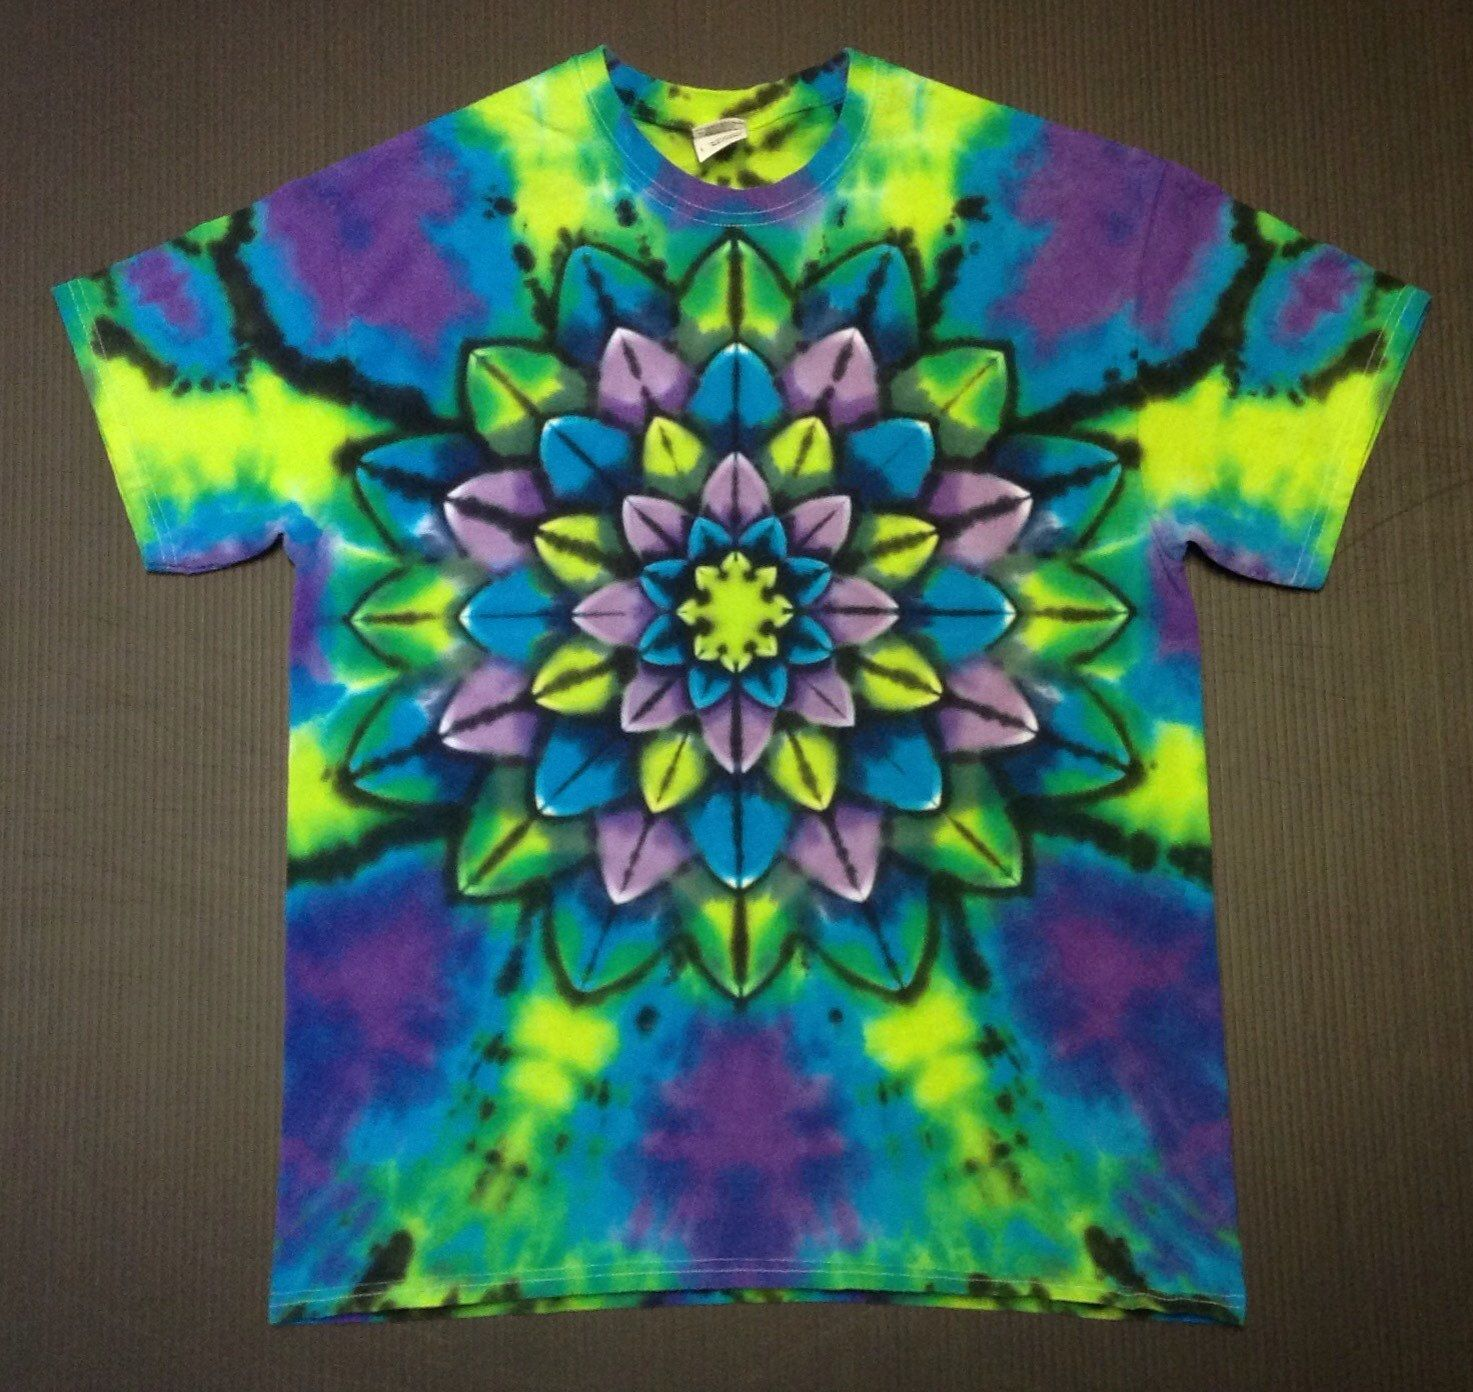 Tulip Tie Dye T Shirt Party Simple Tie Dye Patterns Rainbow